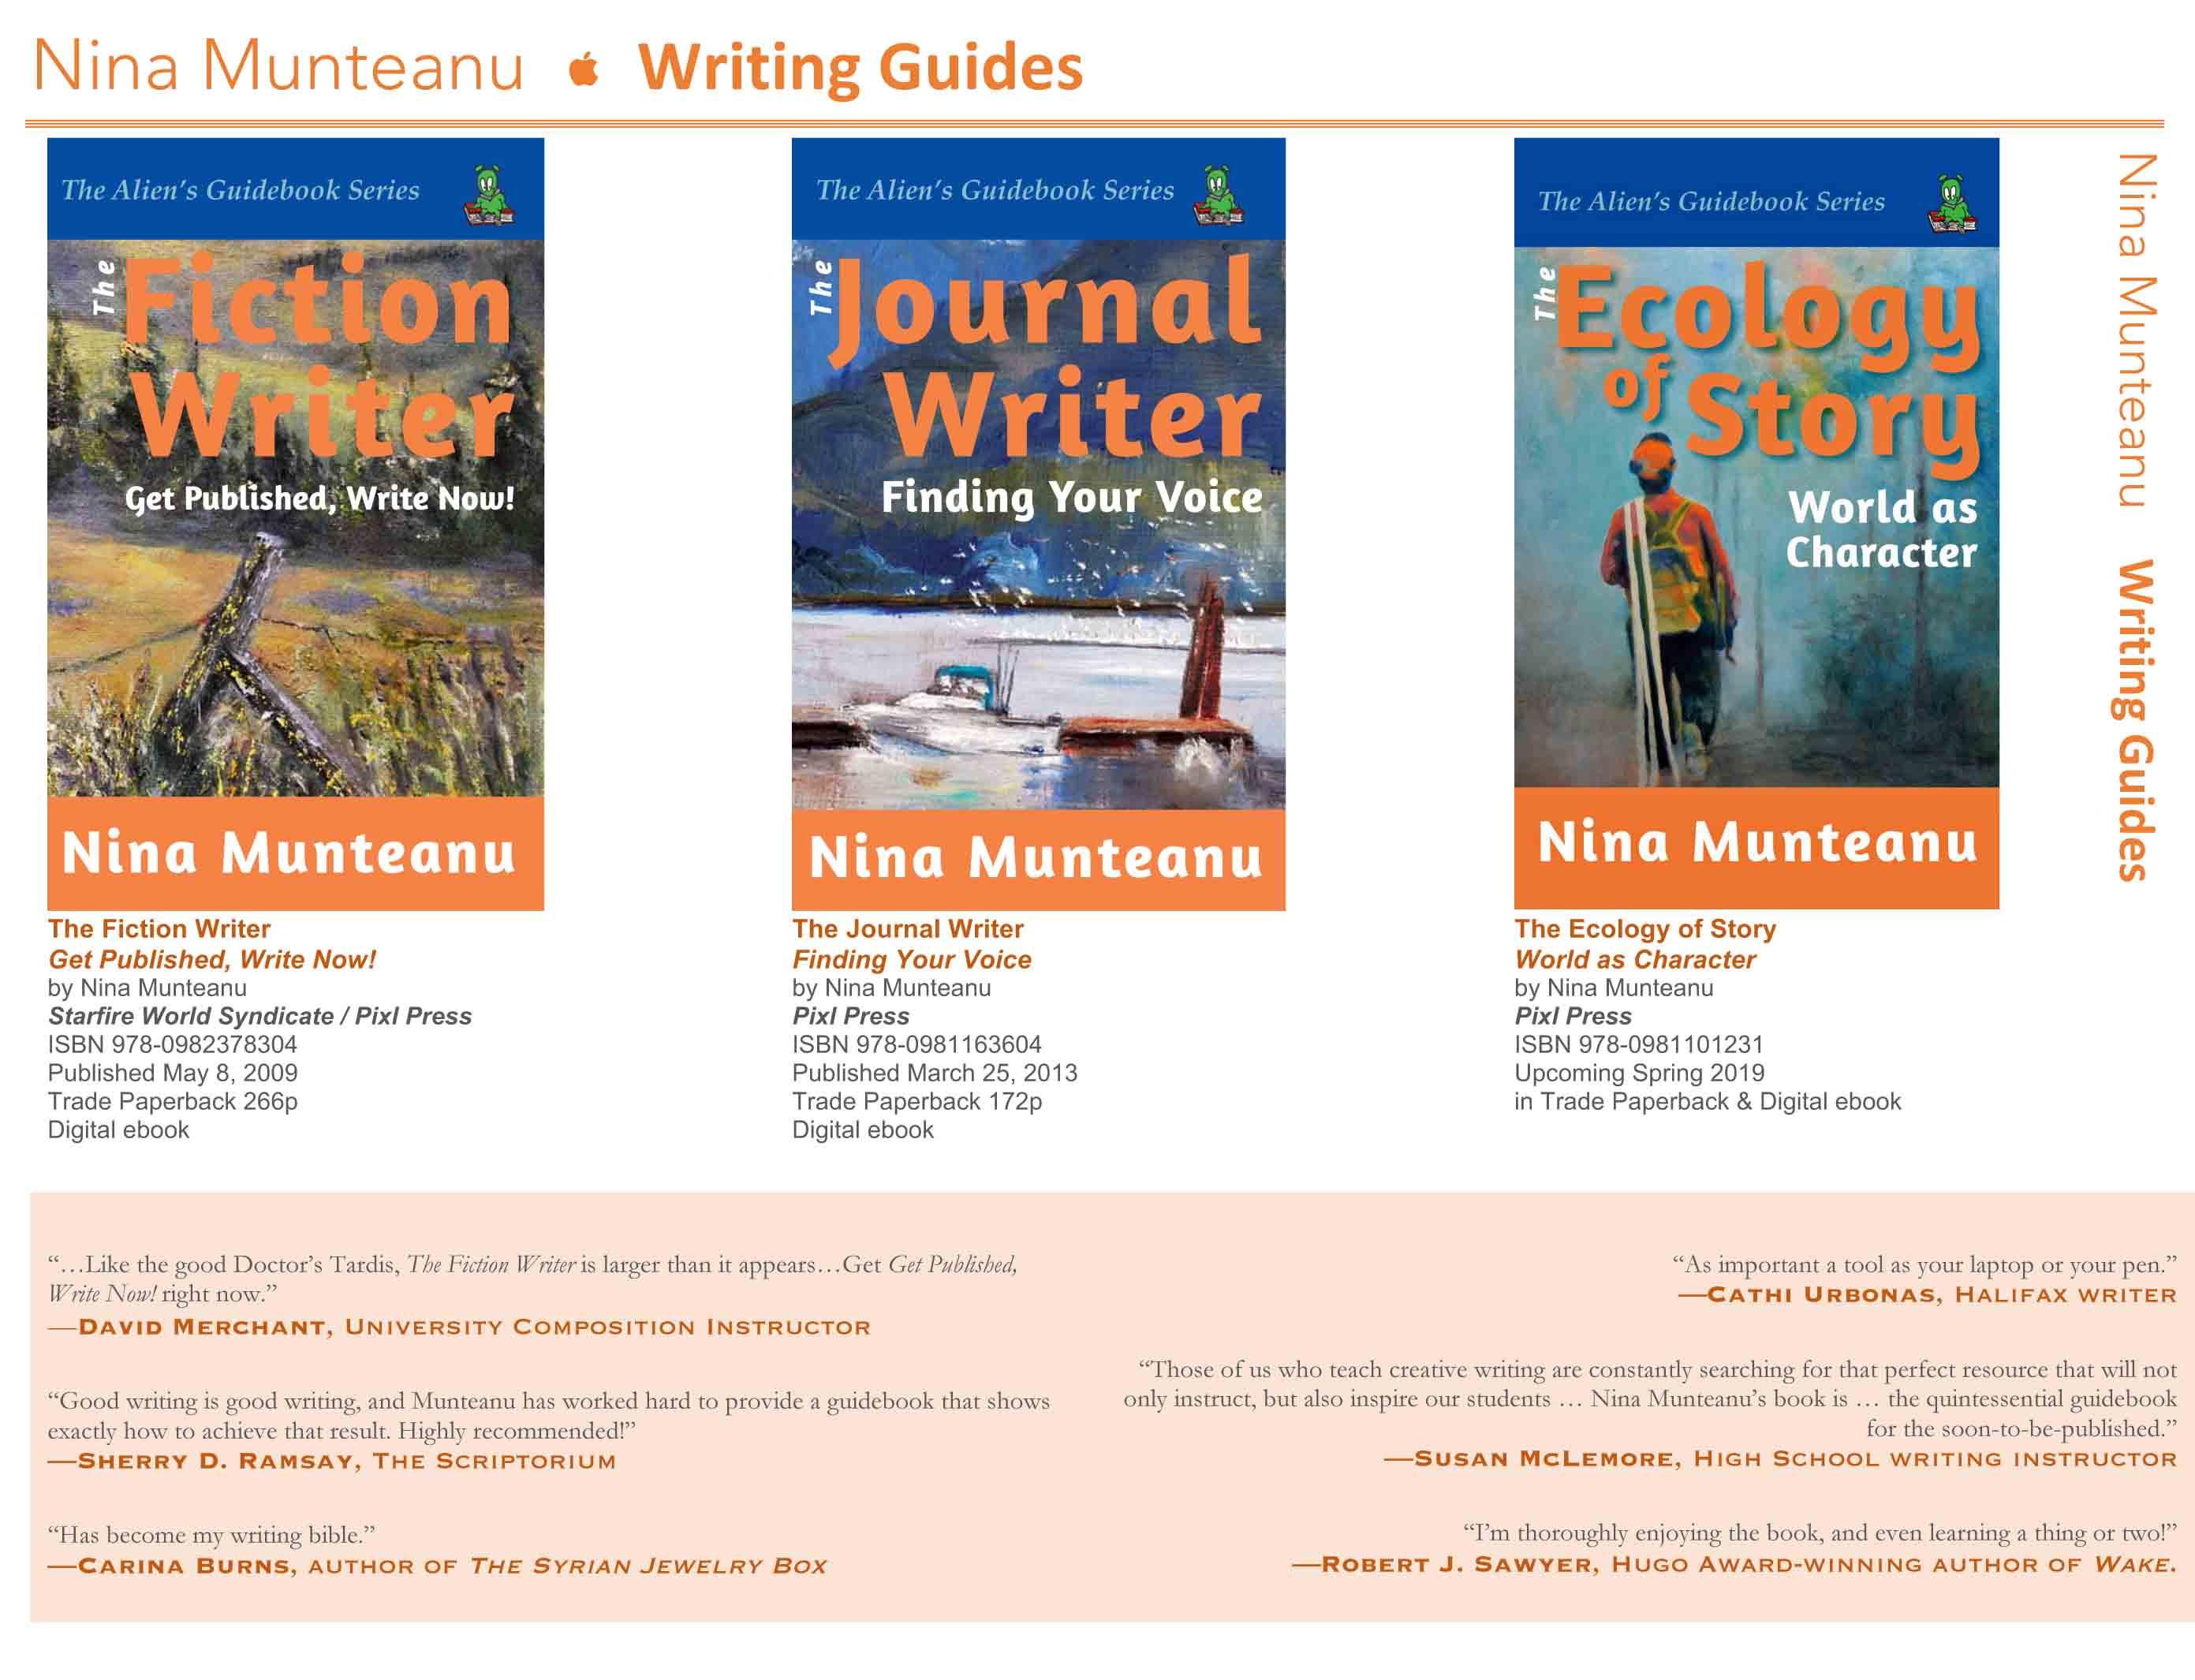 Microsoft Word - Three Writing Guides.docx